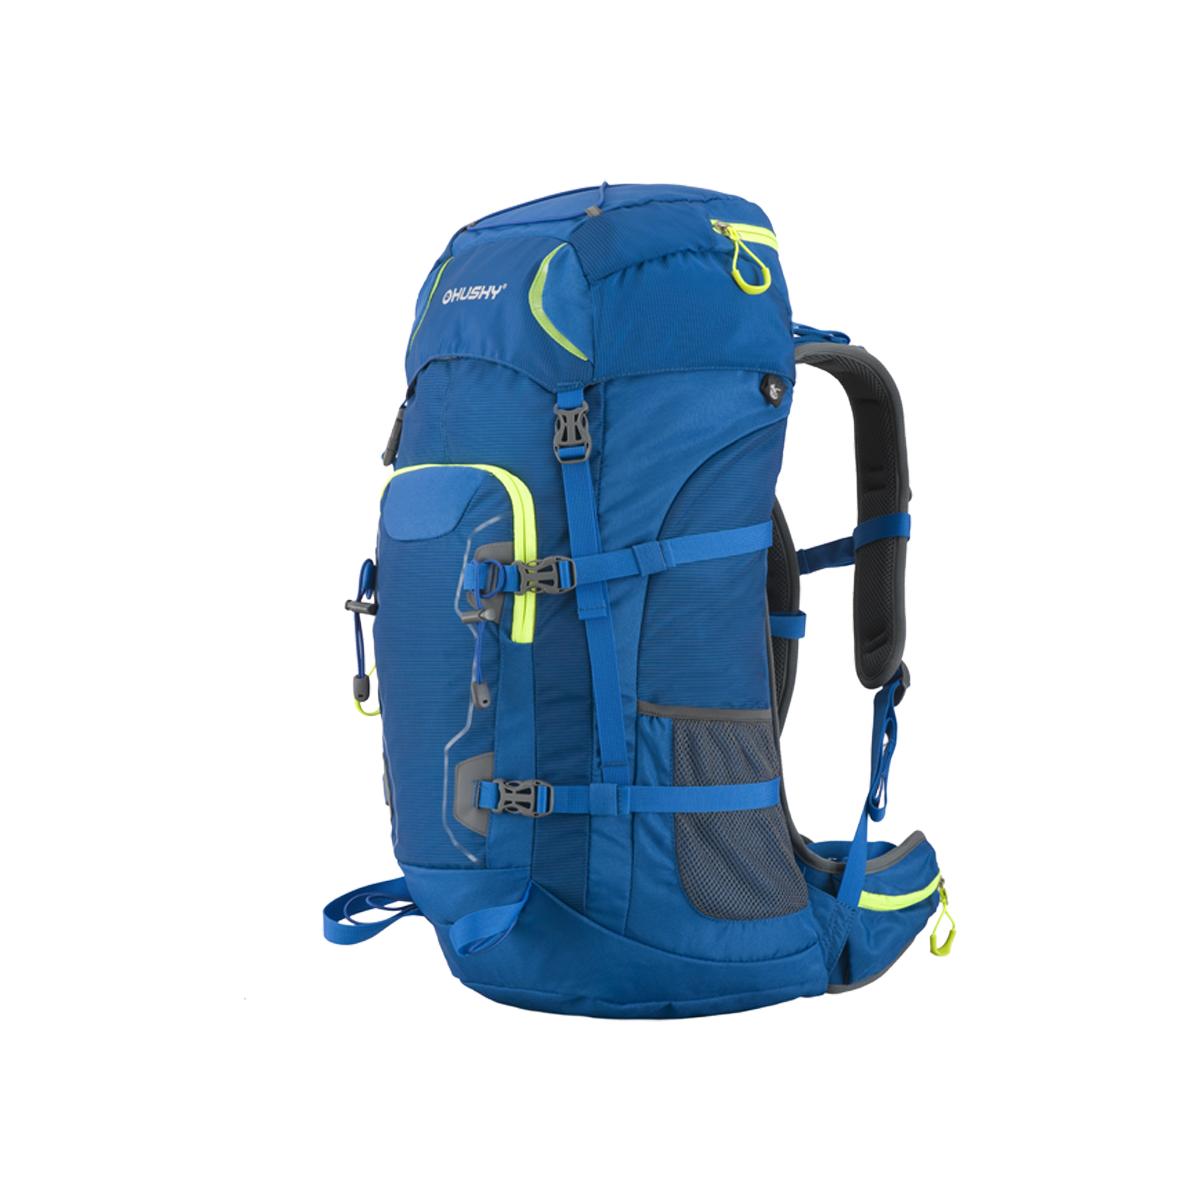 Batoh Expedice   Turistika - Sloper 45 l – modrá  eede01f51f